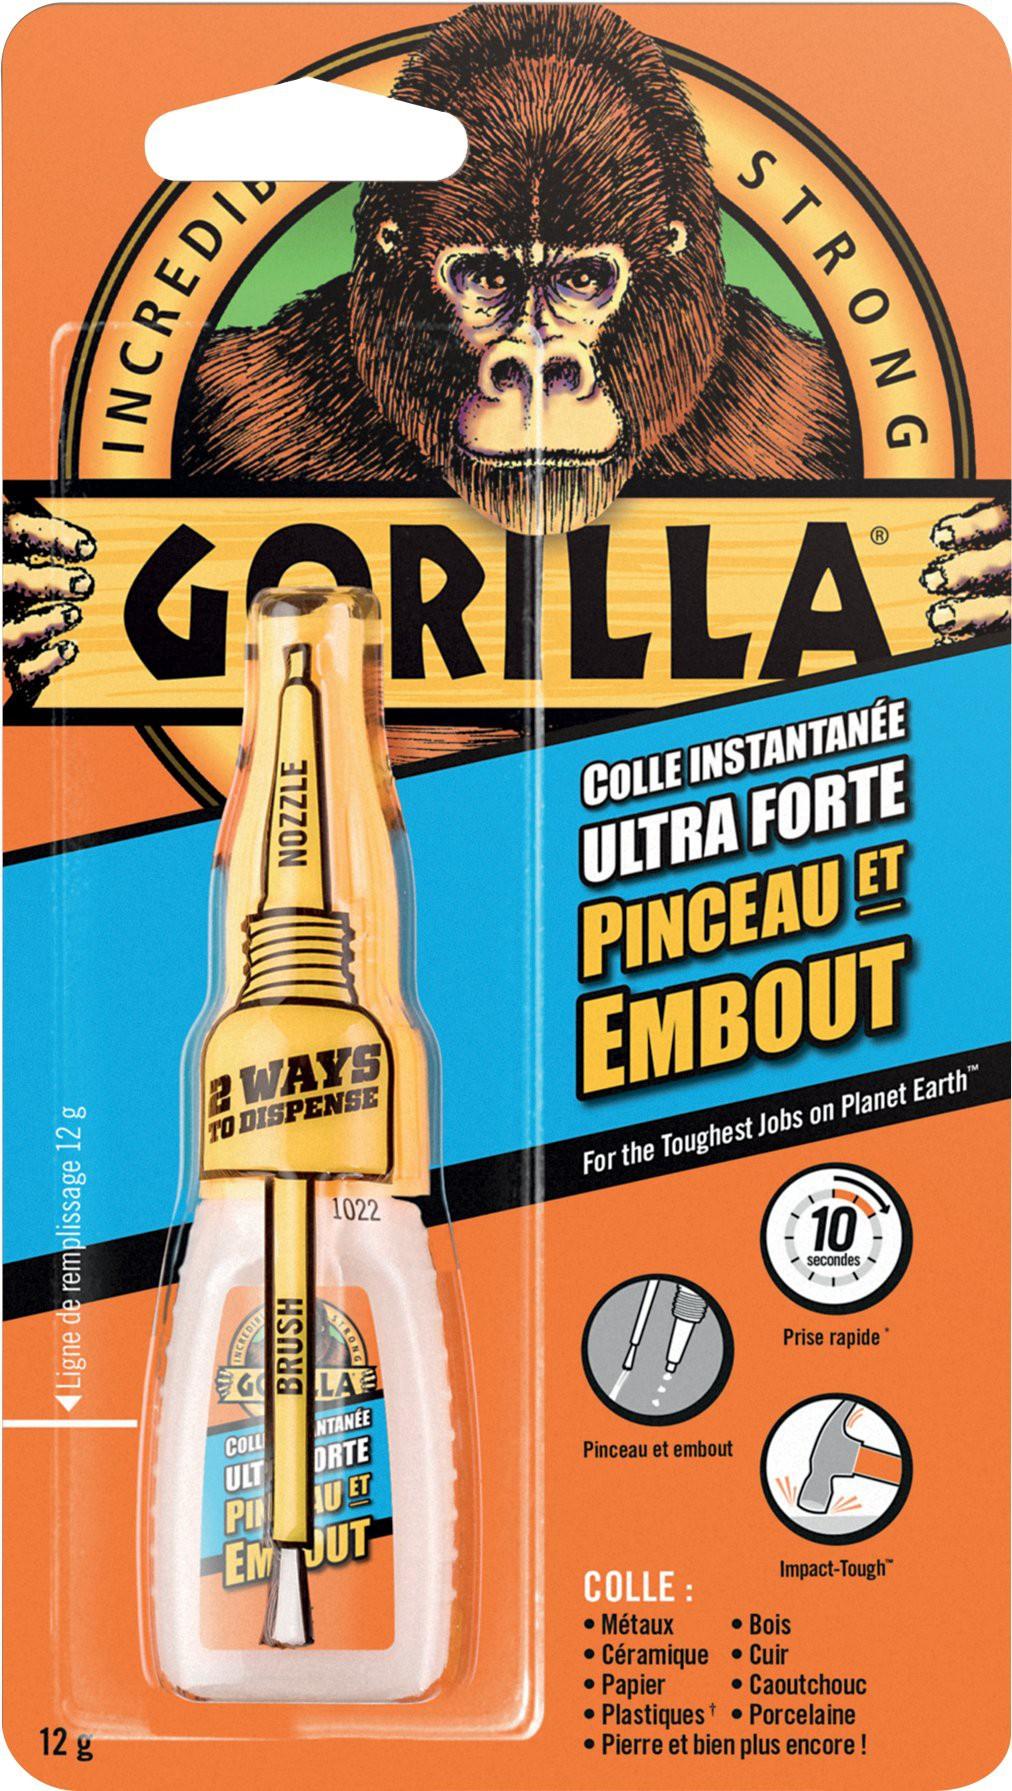 Colle ultra forte instantanée Gorilla Super Glue avec pinceau